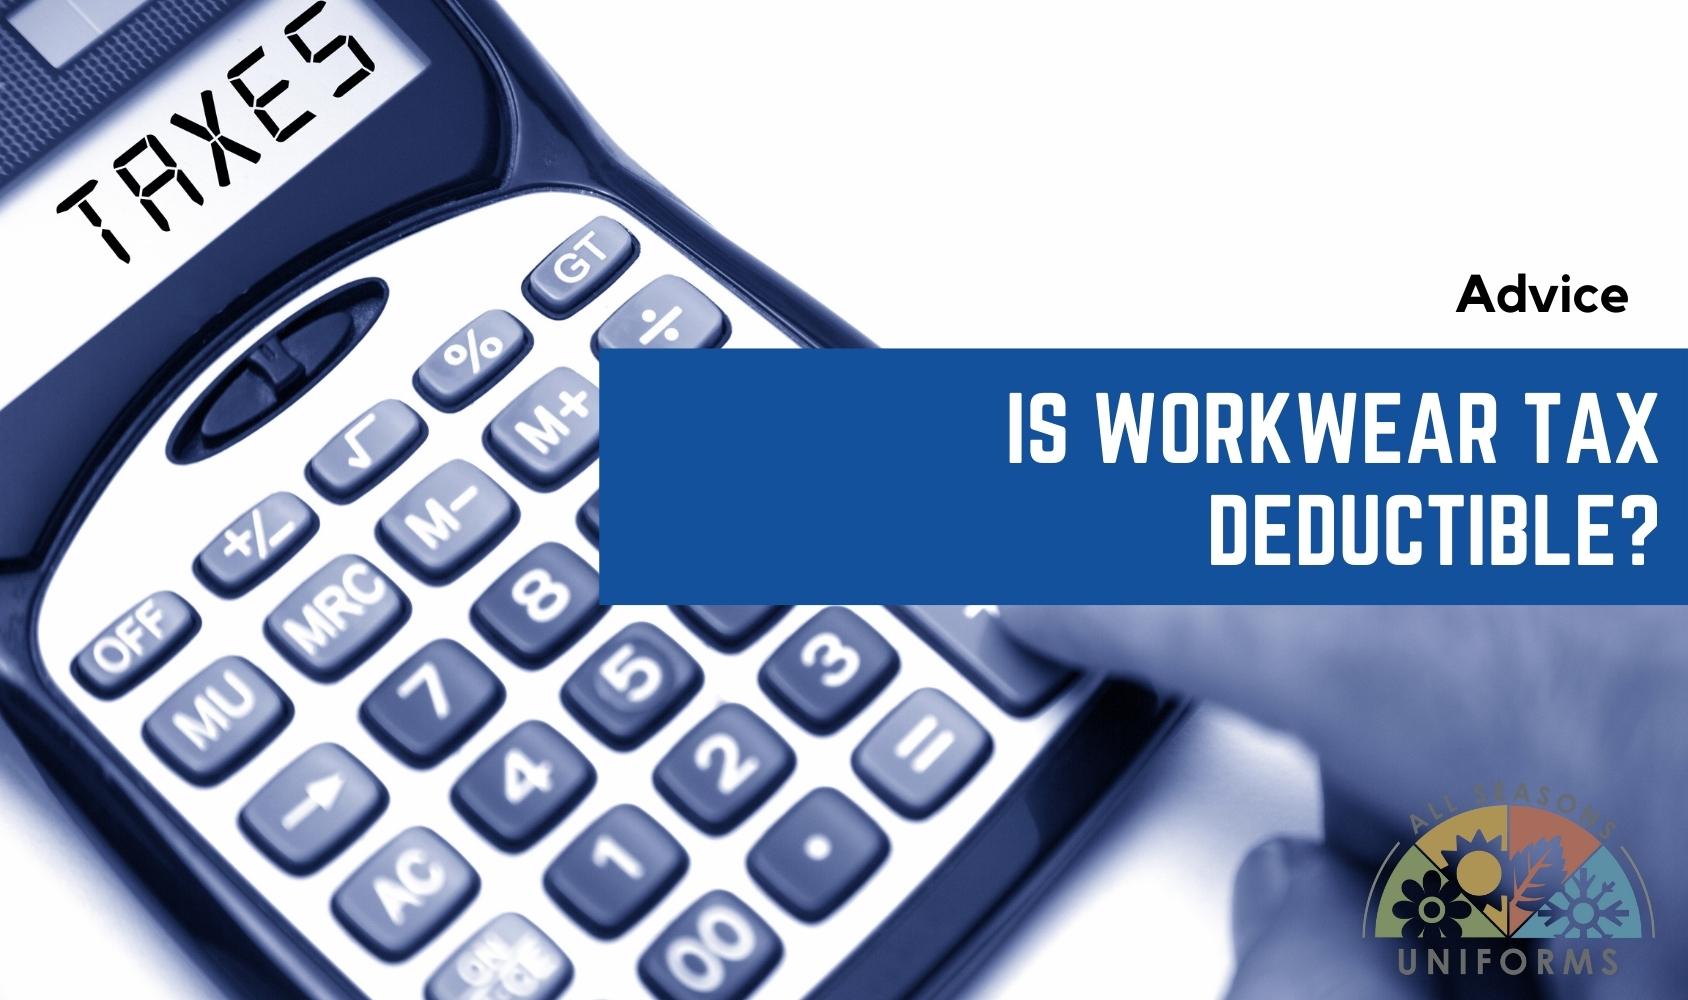 The Great Tax Debate – Is Workwear Tax Deductible?